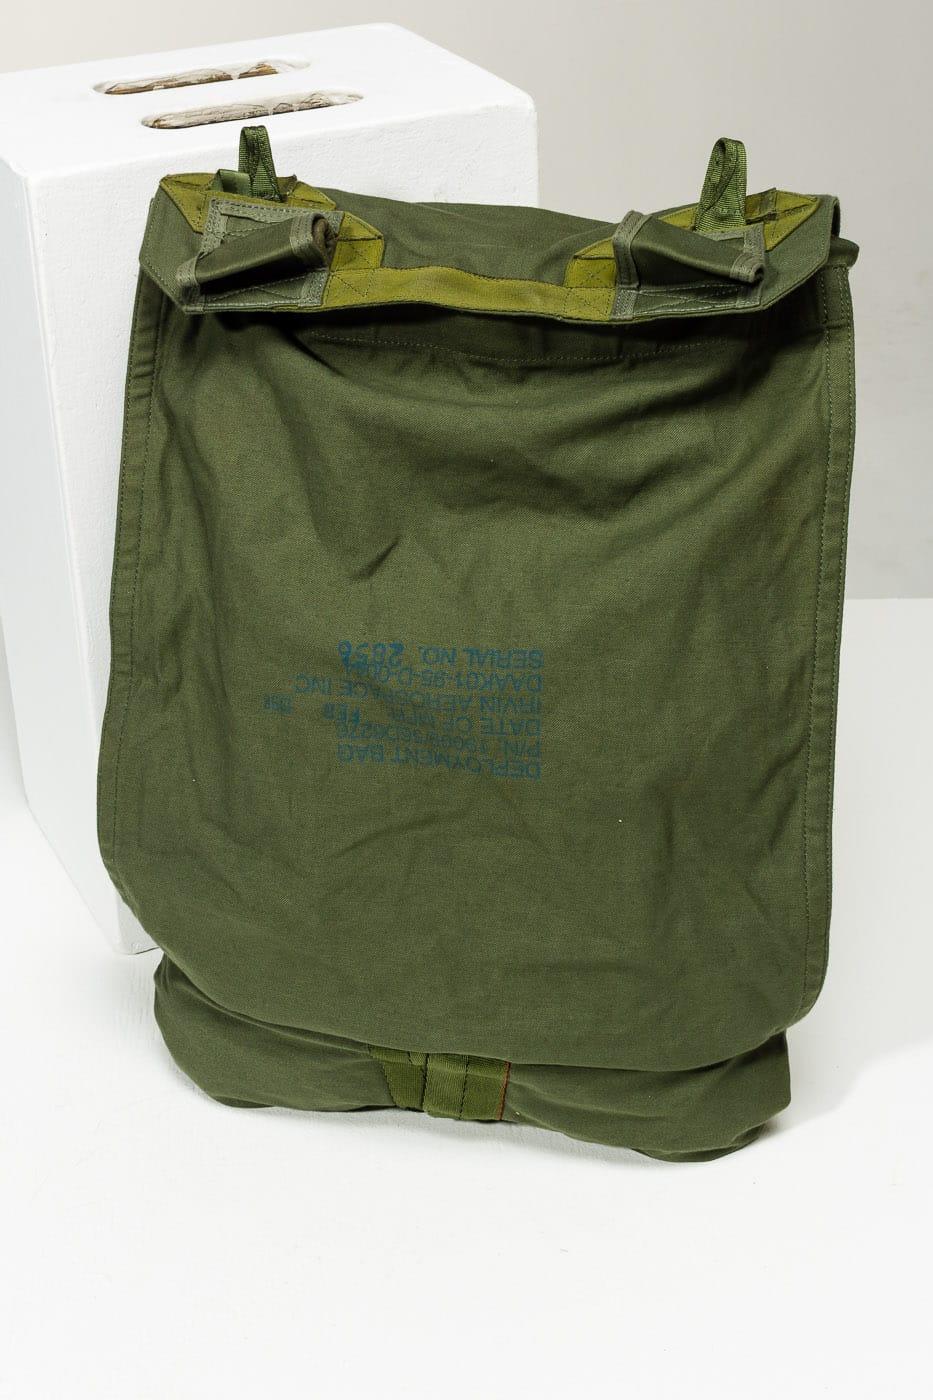 Mt018 Infantry Parachute Bag Prop Rental Acme Brooklyn